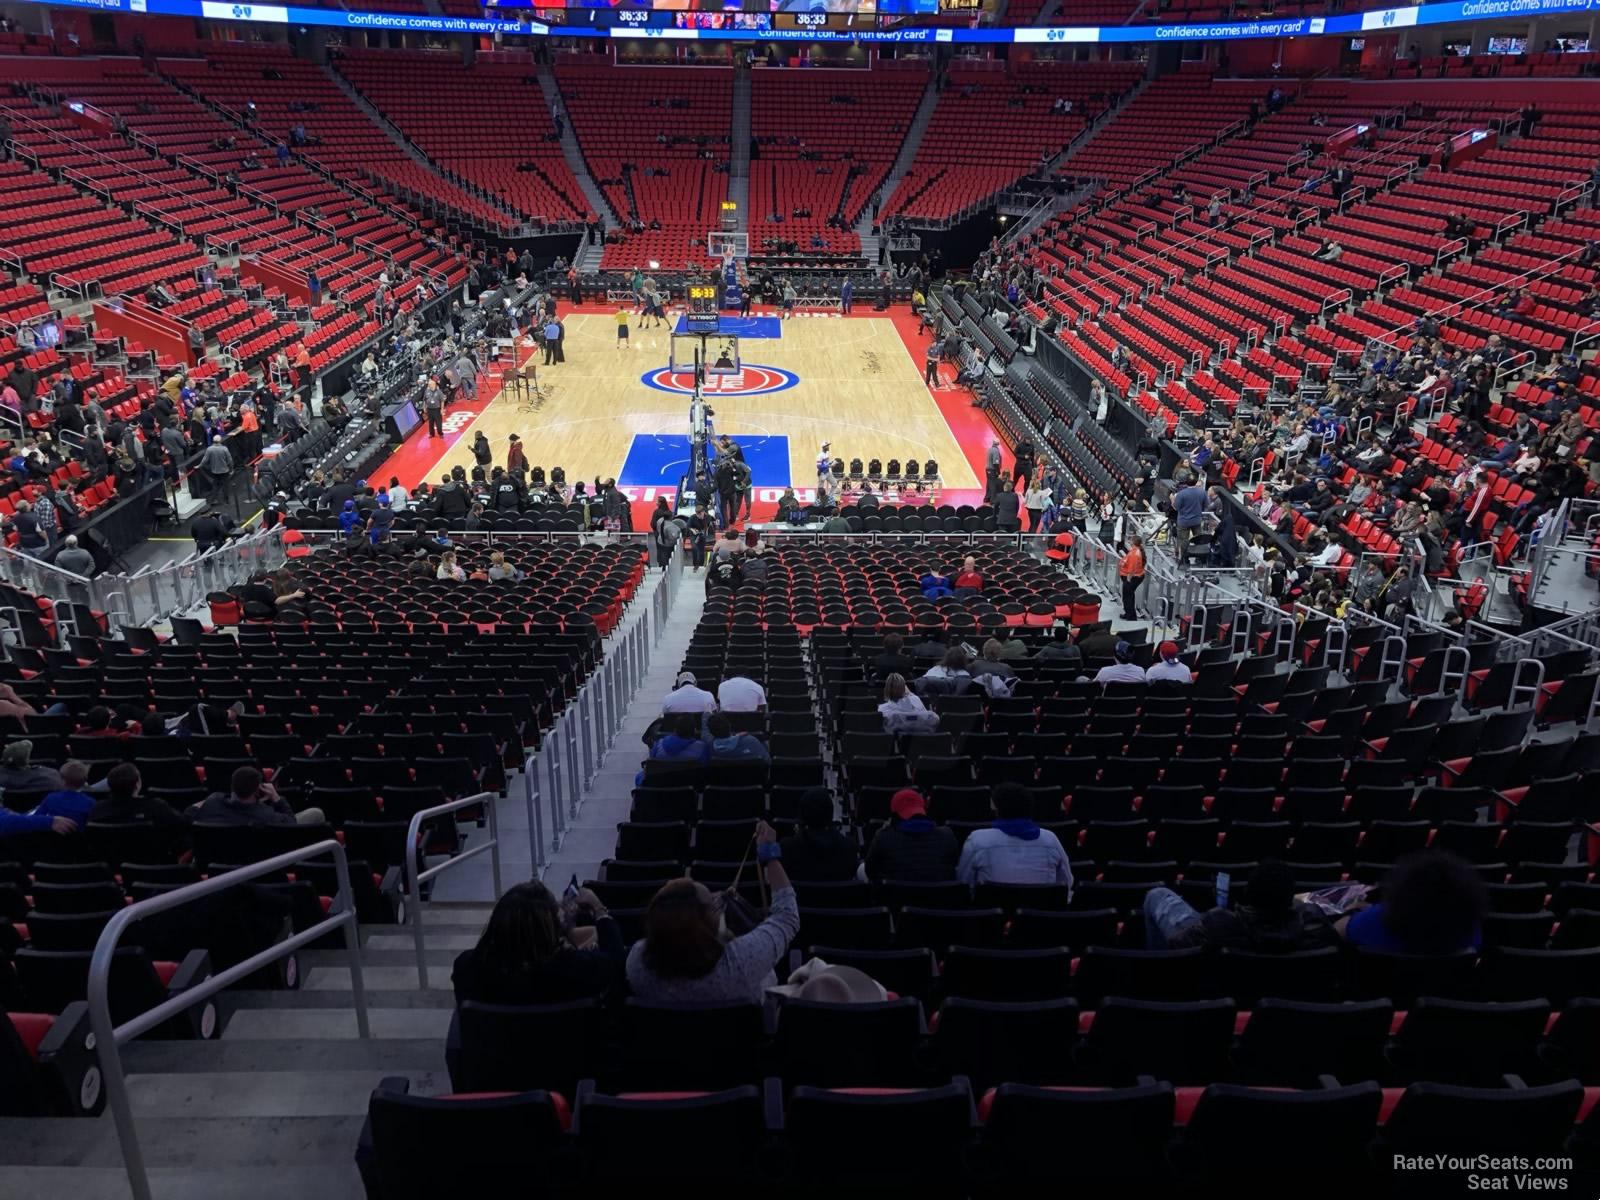 Little Caesars Arena Section 115 - Detroit Pistons - RateYourSeats.com